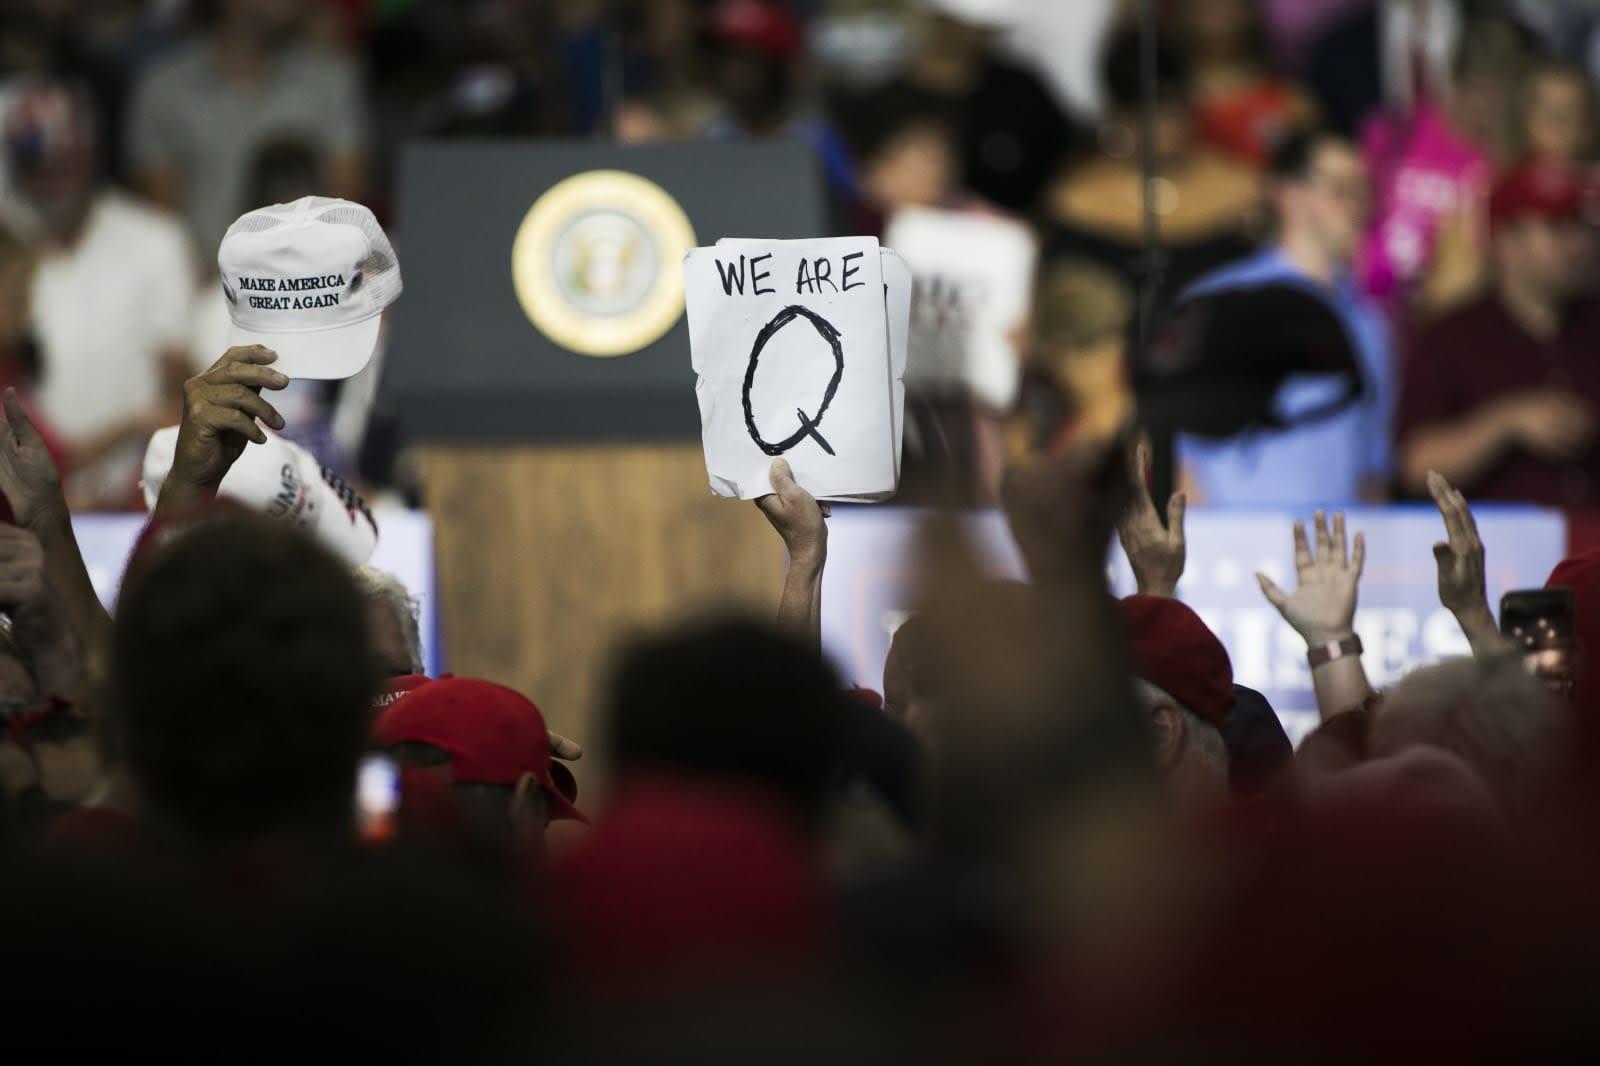 Reddit Bans Communities Promoting Qanon Conspiracy Theory